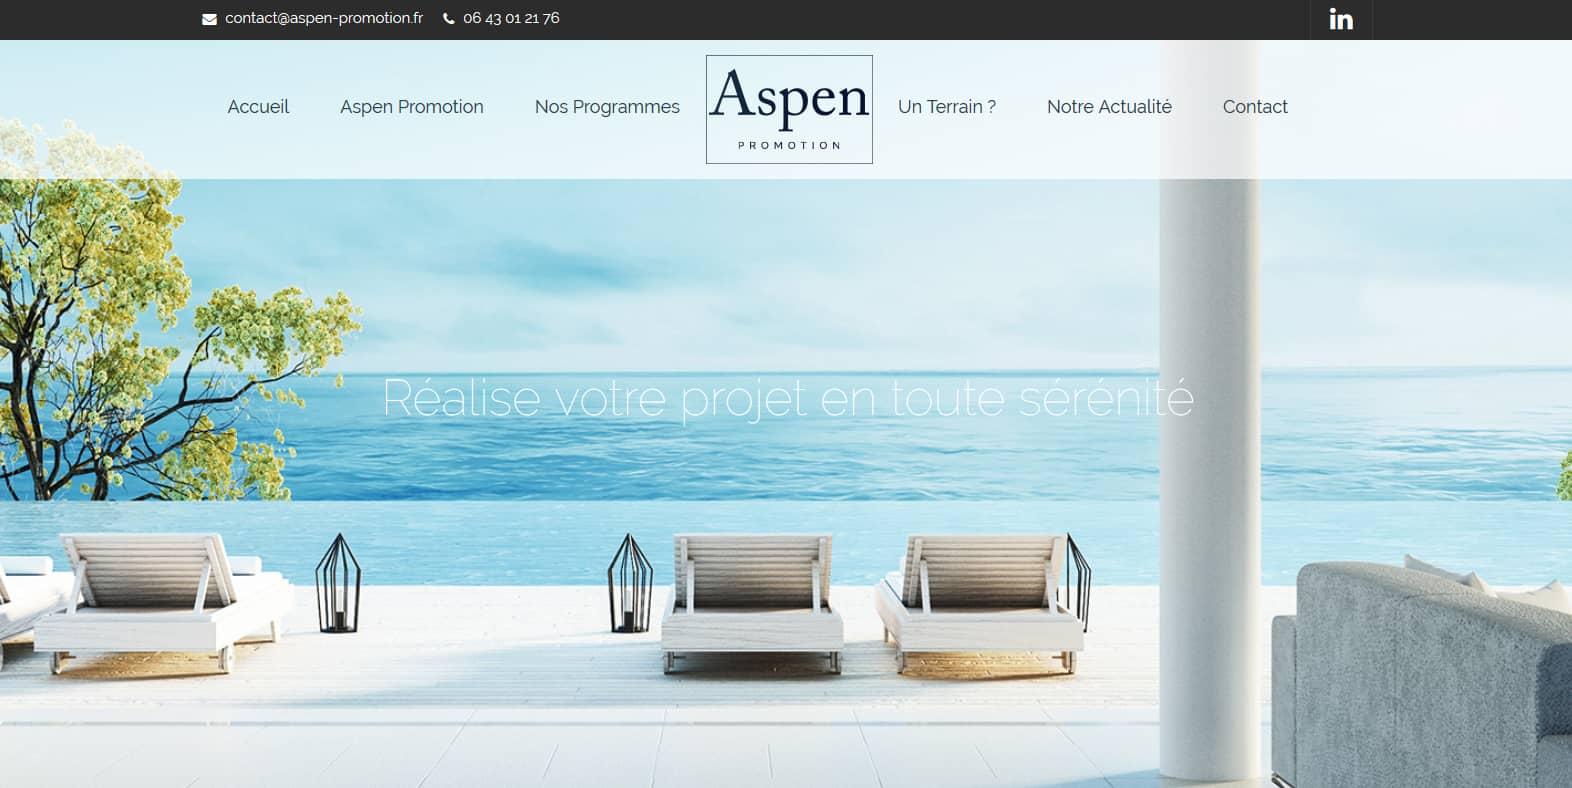 aspen-promotion